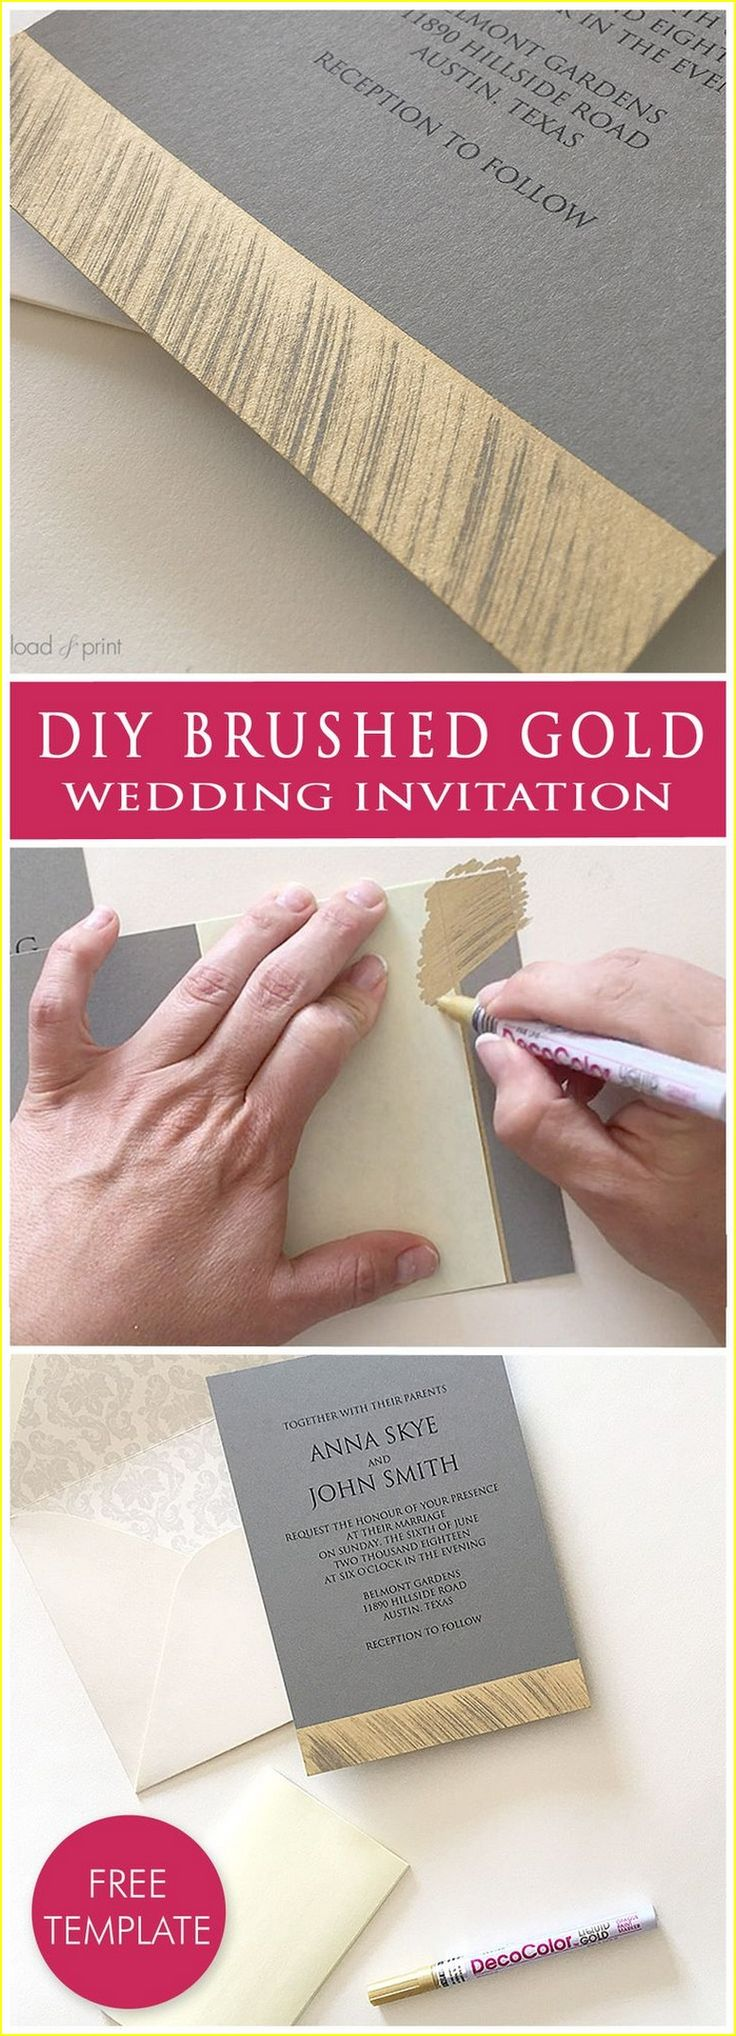 Choosing 50 Good DIY Weddings Invitations 37